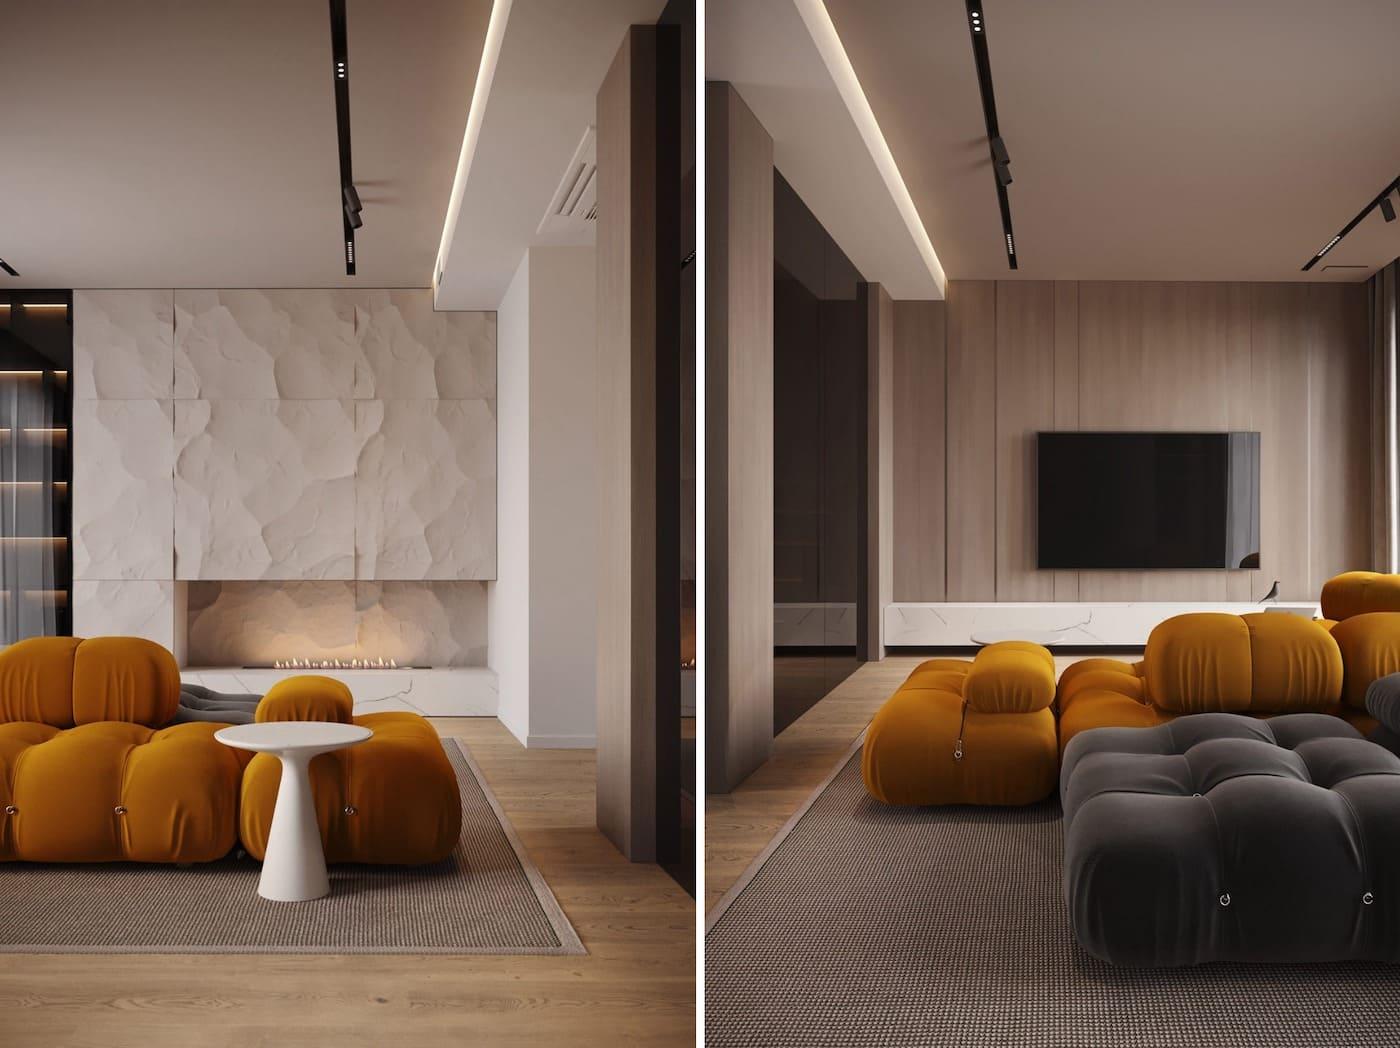 дизайн интерьера модной квартиры фото 2